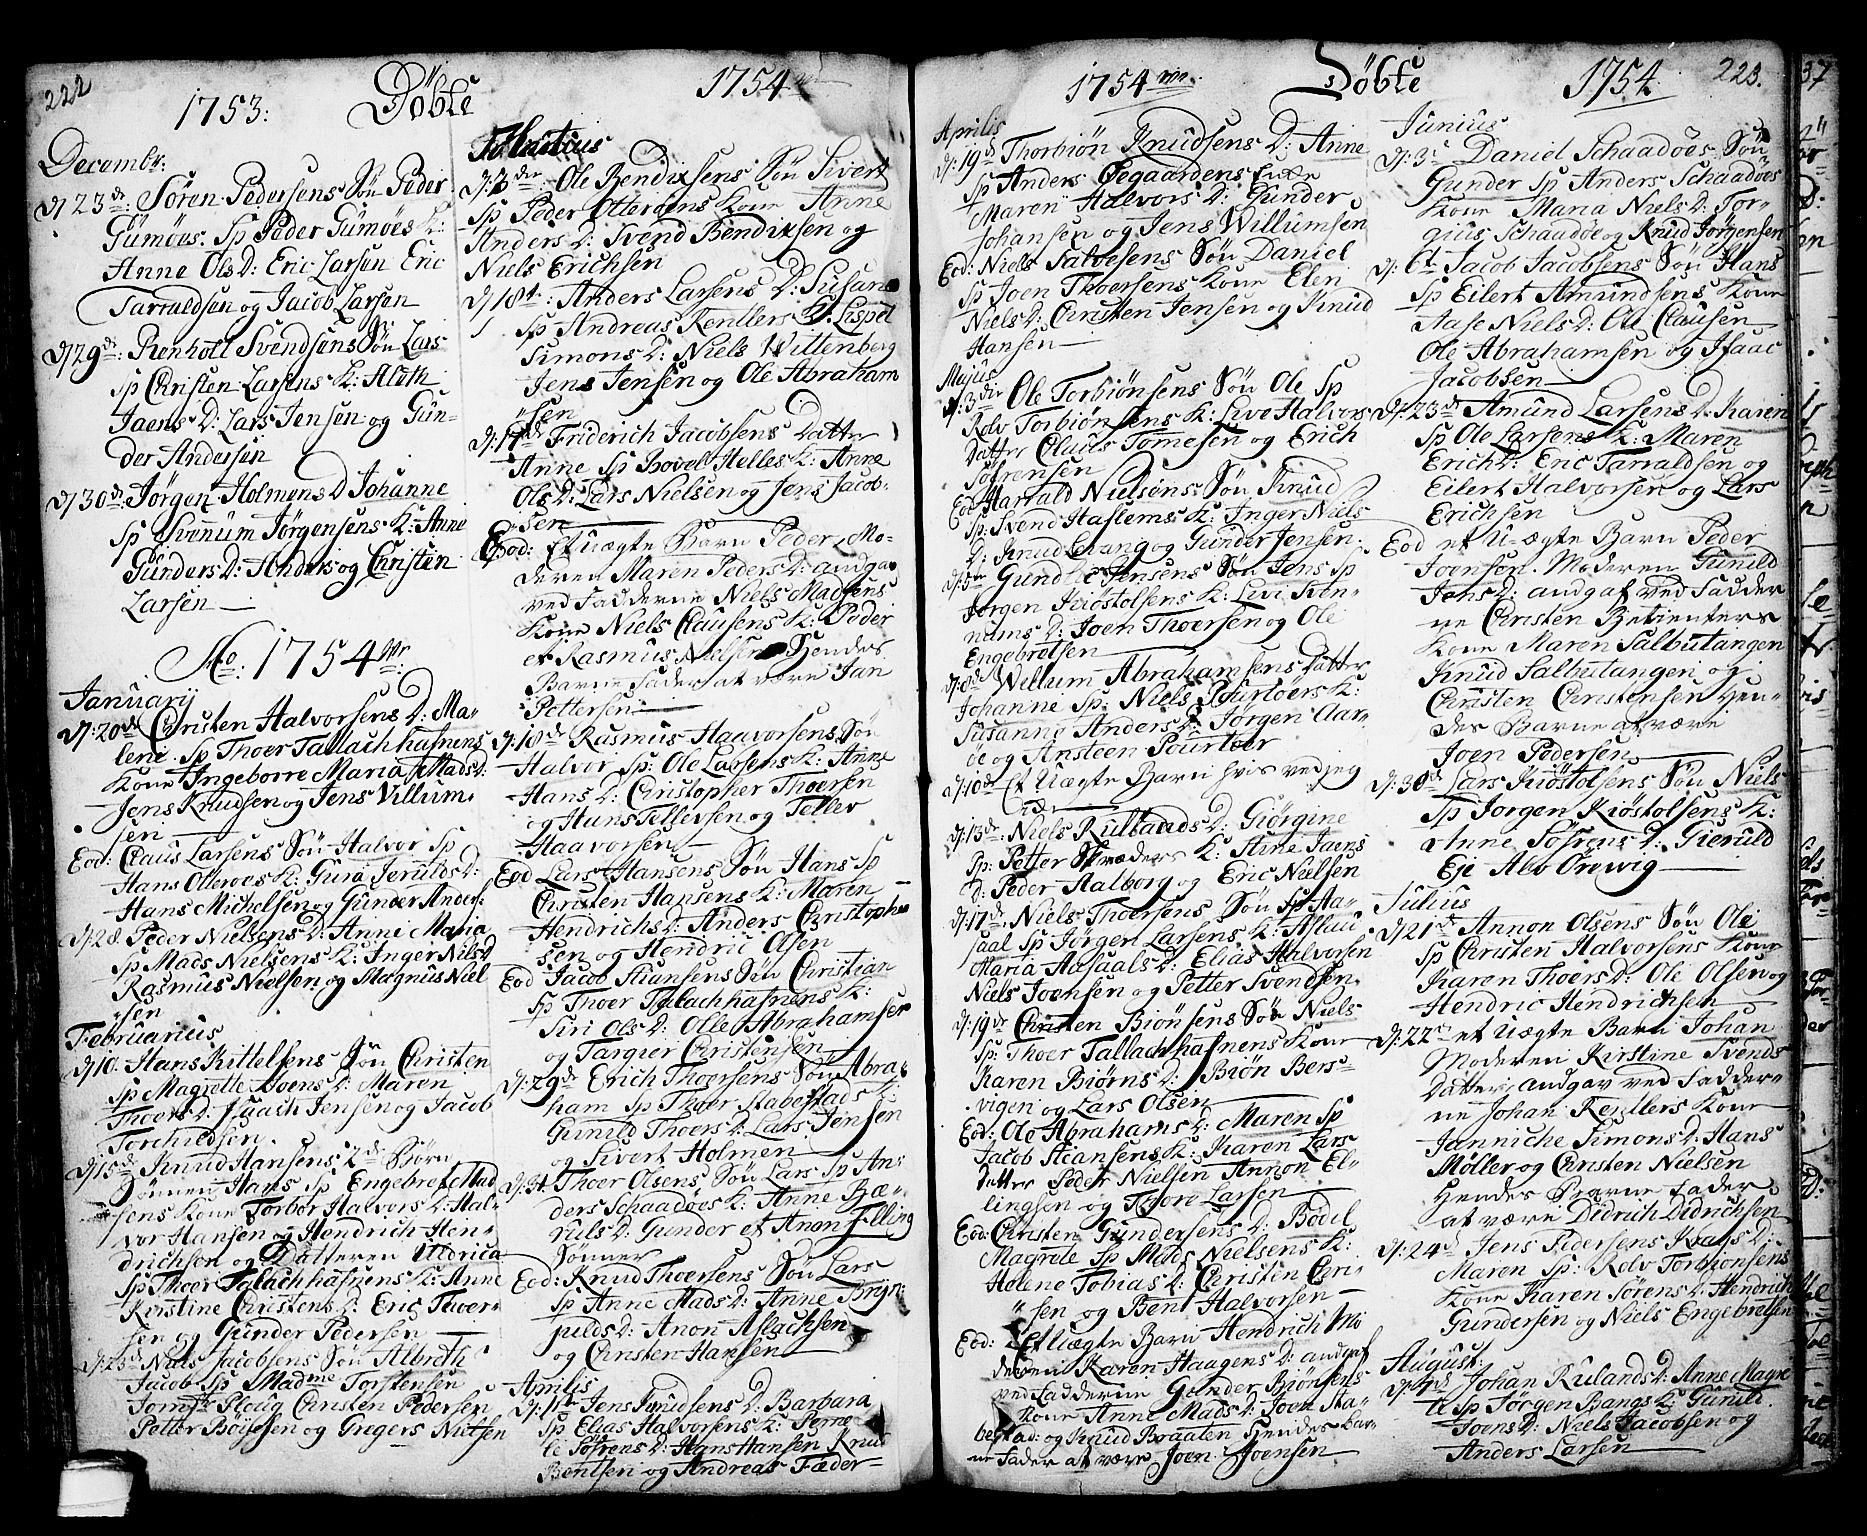 SAKO, Kragerø kirkebøker, F/Fa/L0001: Ministerialbok nr. 1, 1702-1766, s. 222-223